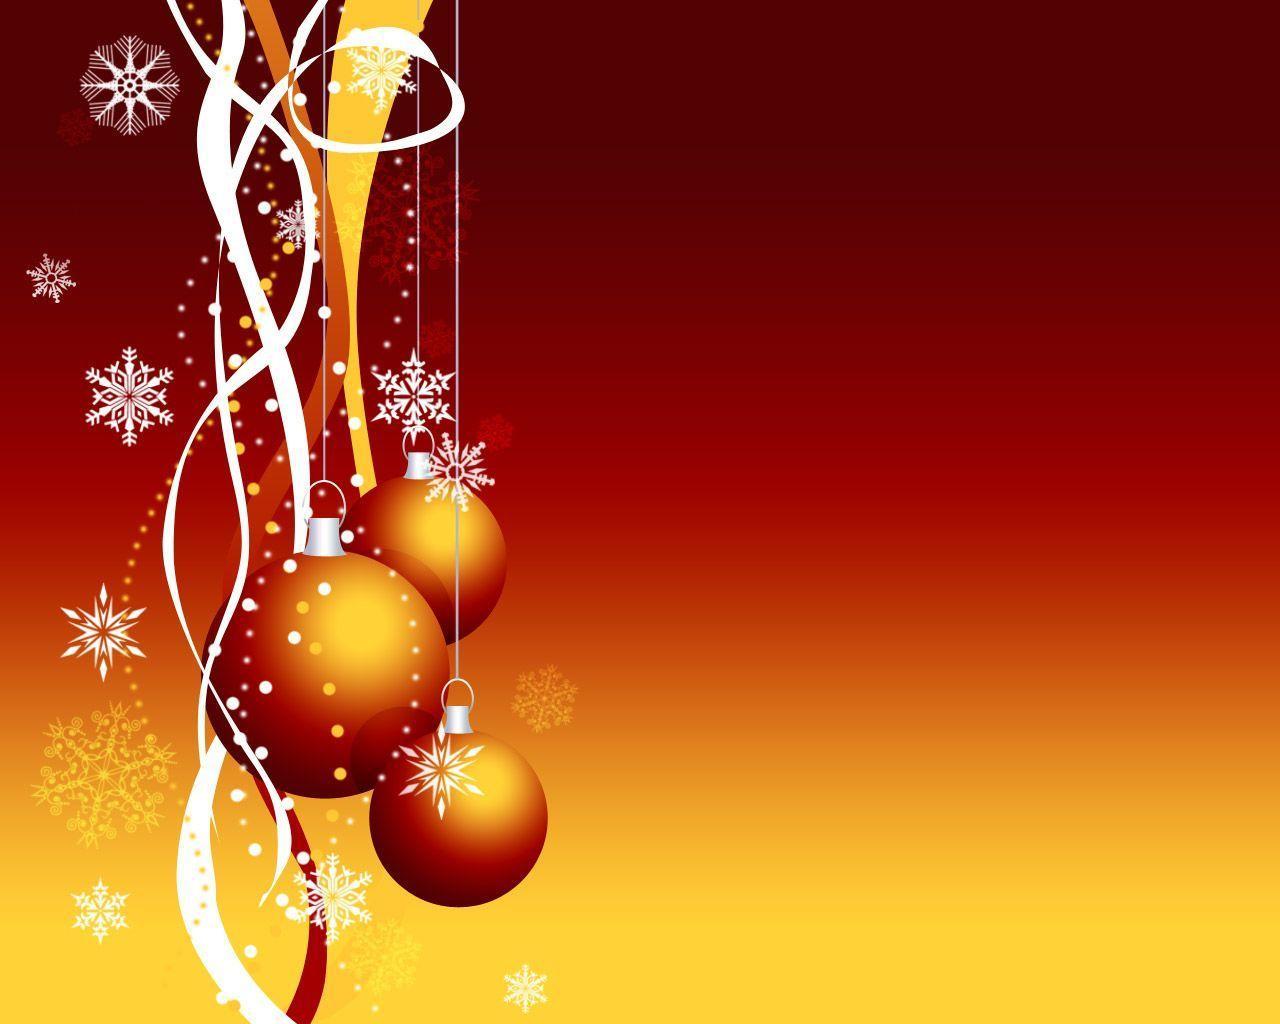 Holidays Christmas Seasonal Festive Hd Wallpaper 1467018: Holiday Desktop Backgrounds